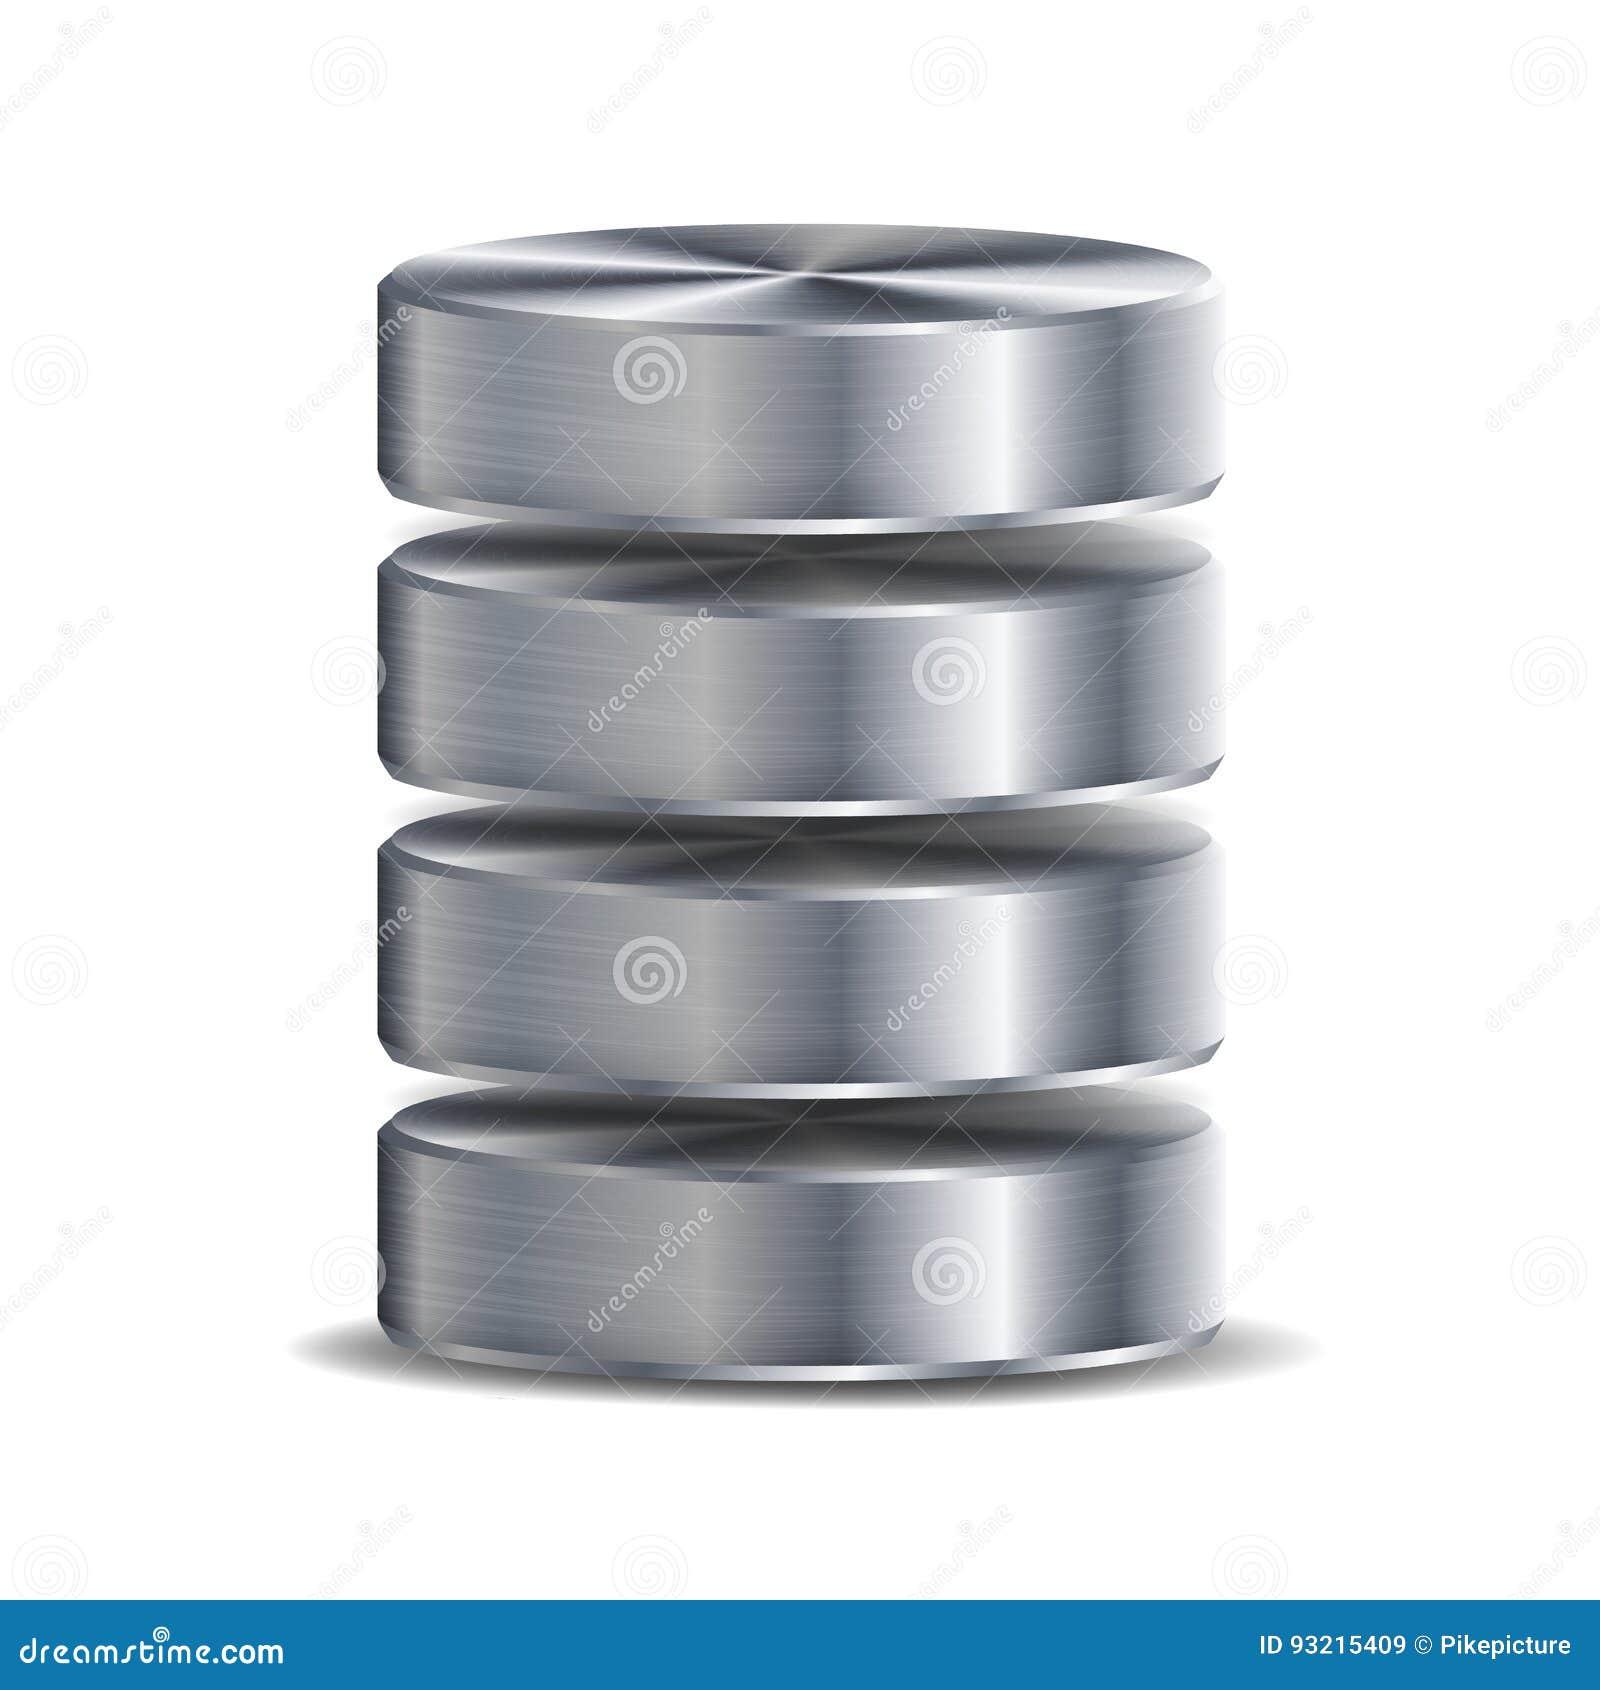 Netz-Datenbank-Disketten-Ikonen-Vektor In hohem Grade ausführliche Illustration der Computer-Festplatte Silber, Chrome-Metall Ers